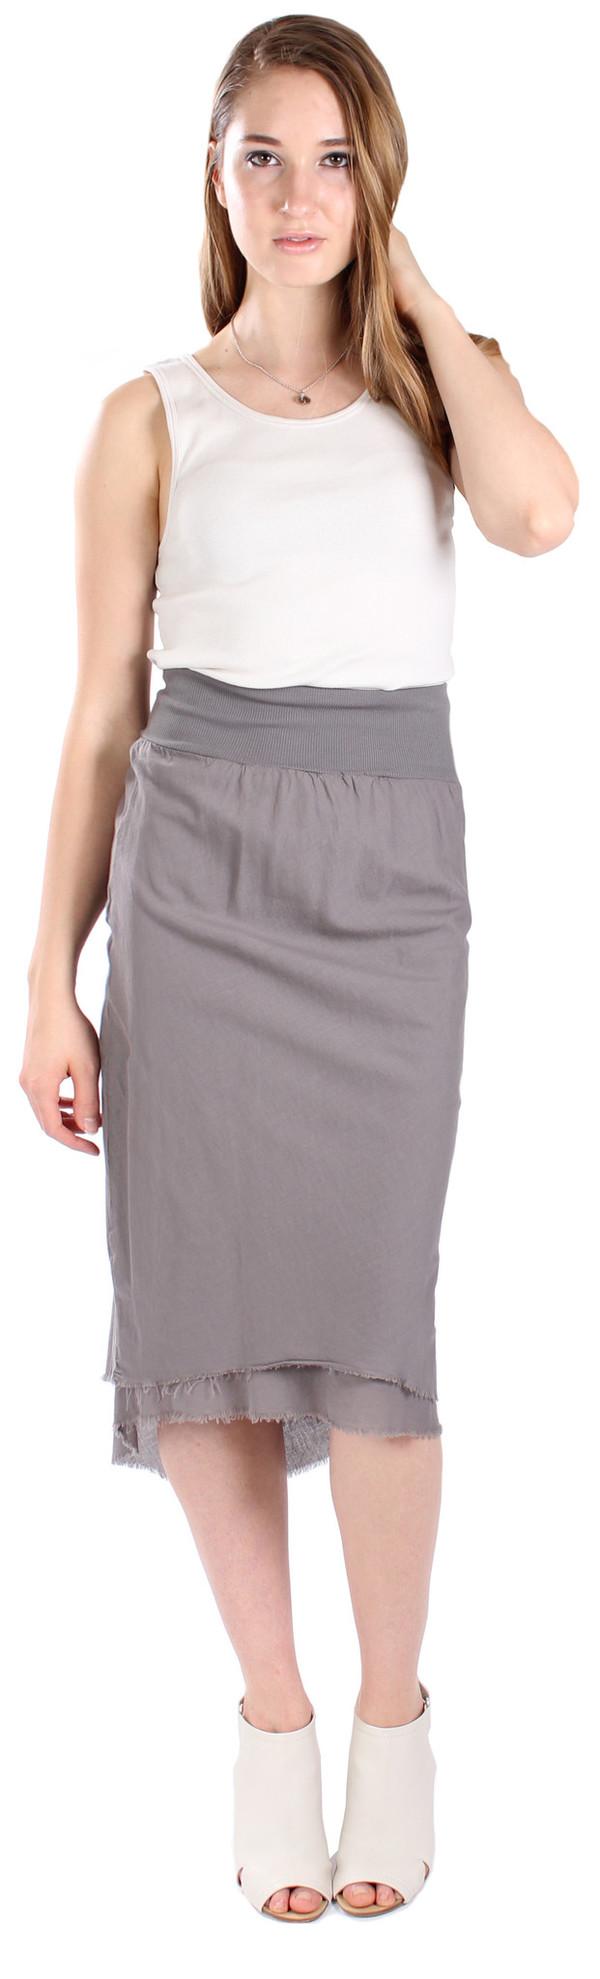 Sirenuse Skirt in Dior Grey